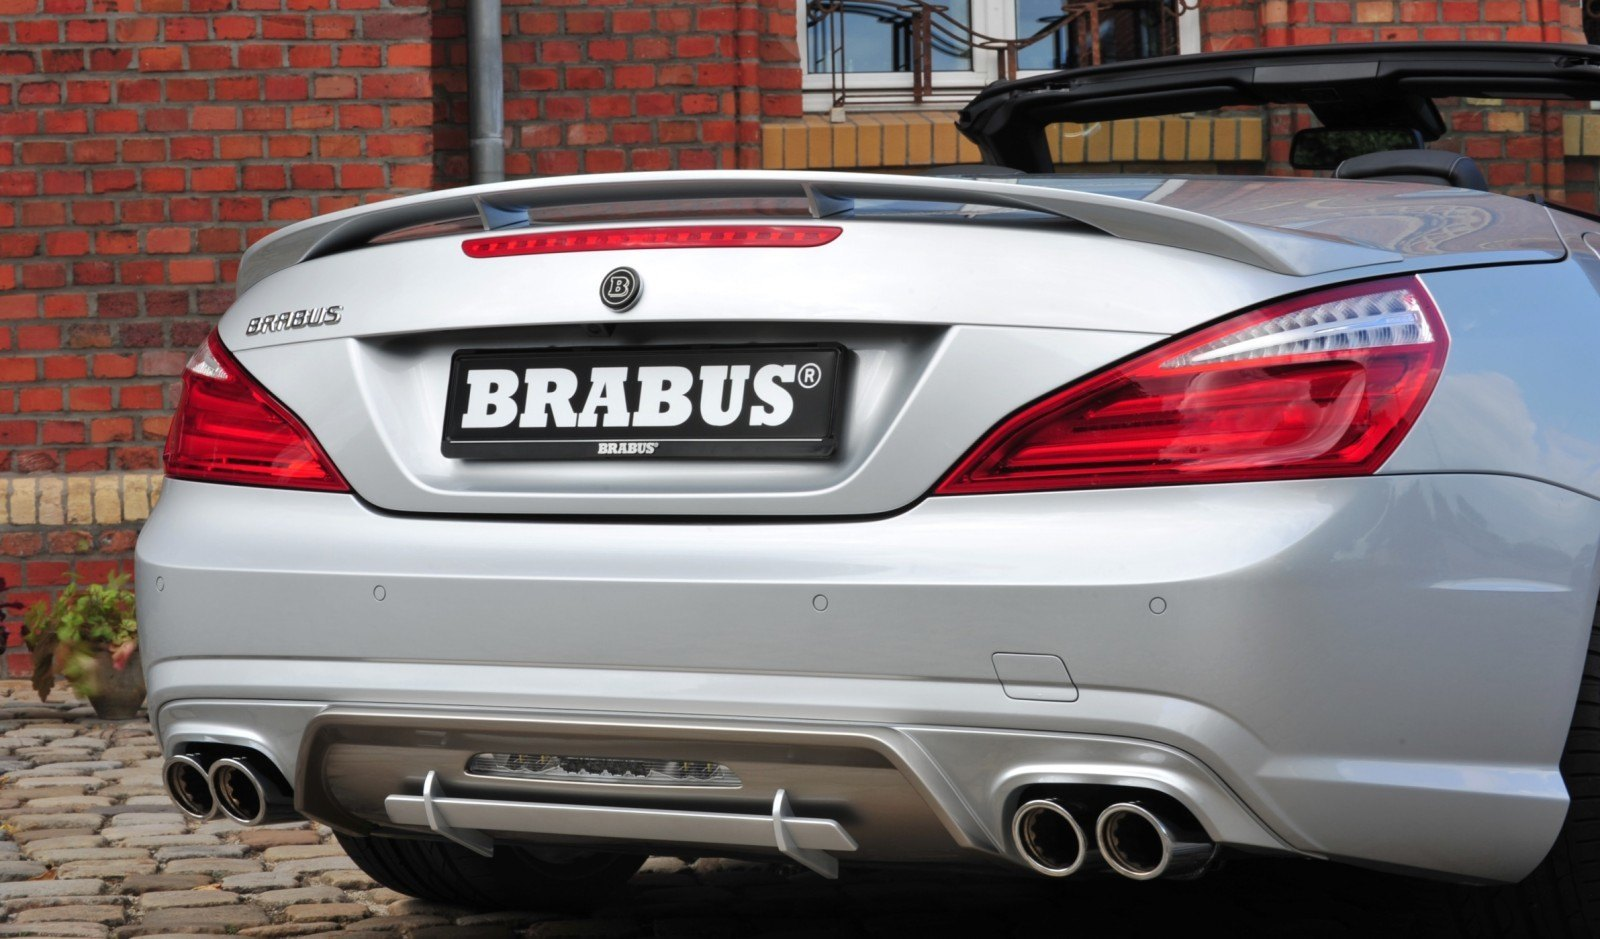 BRABUS Mercedes-Benz SL550 R231 27